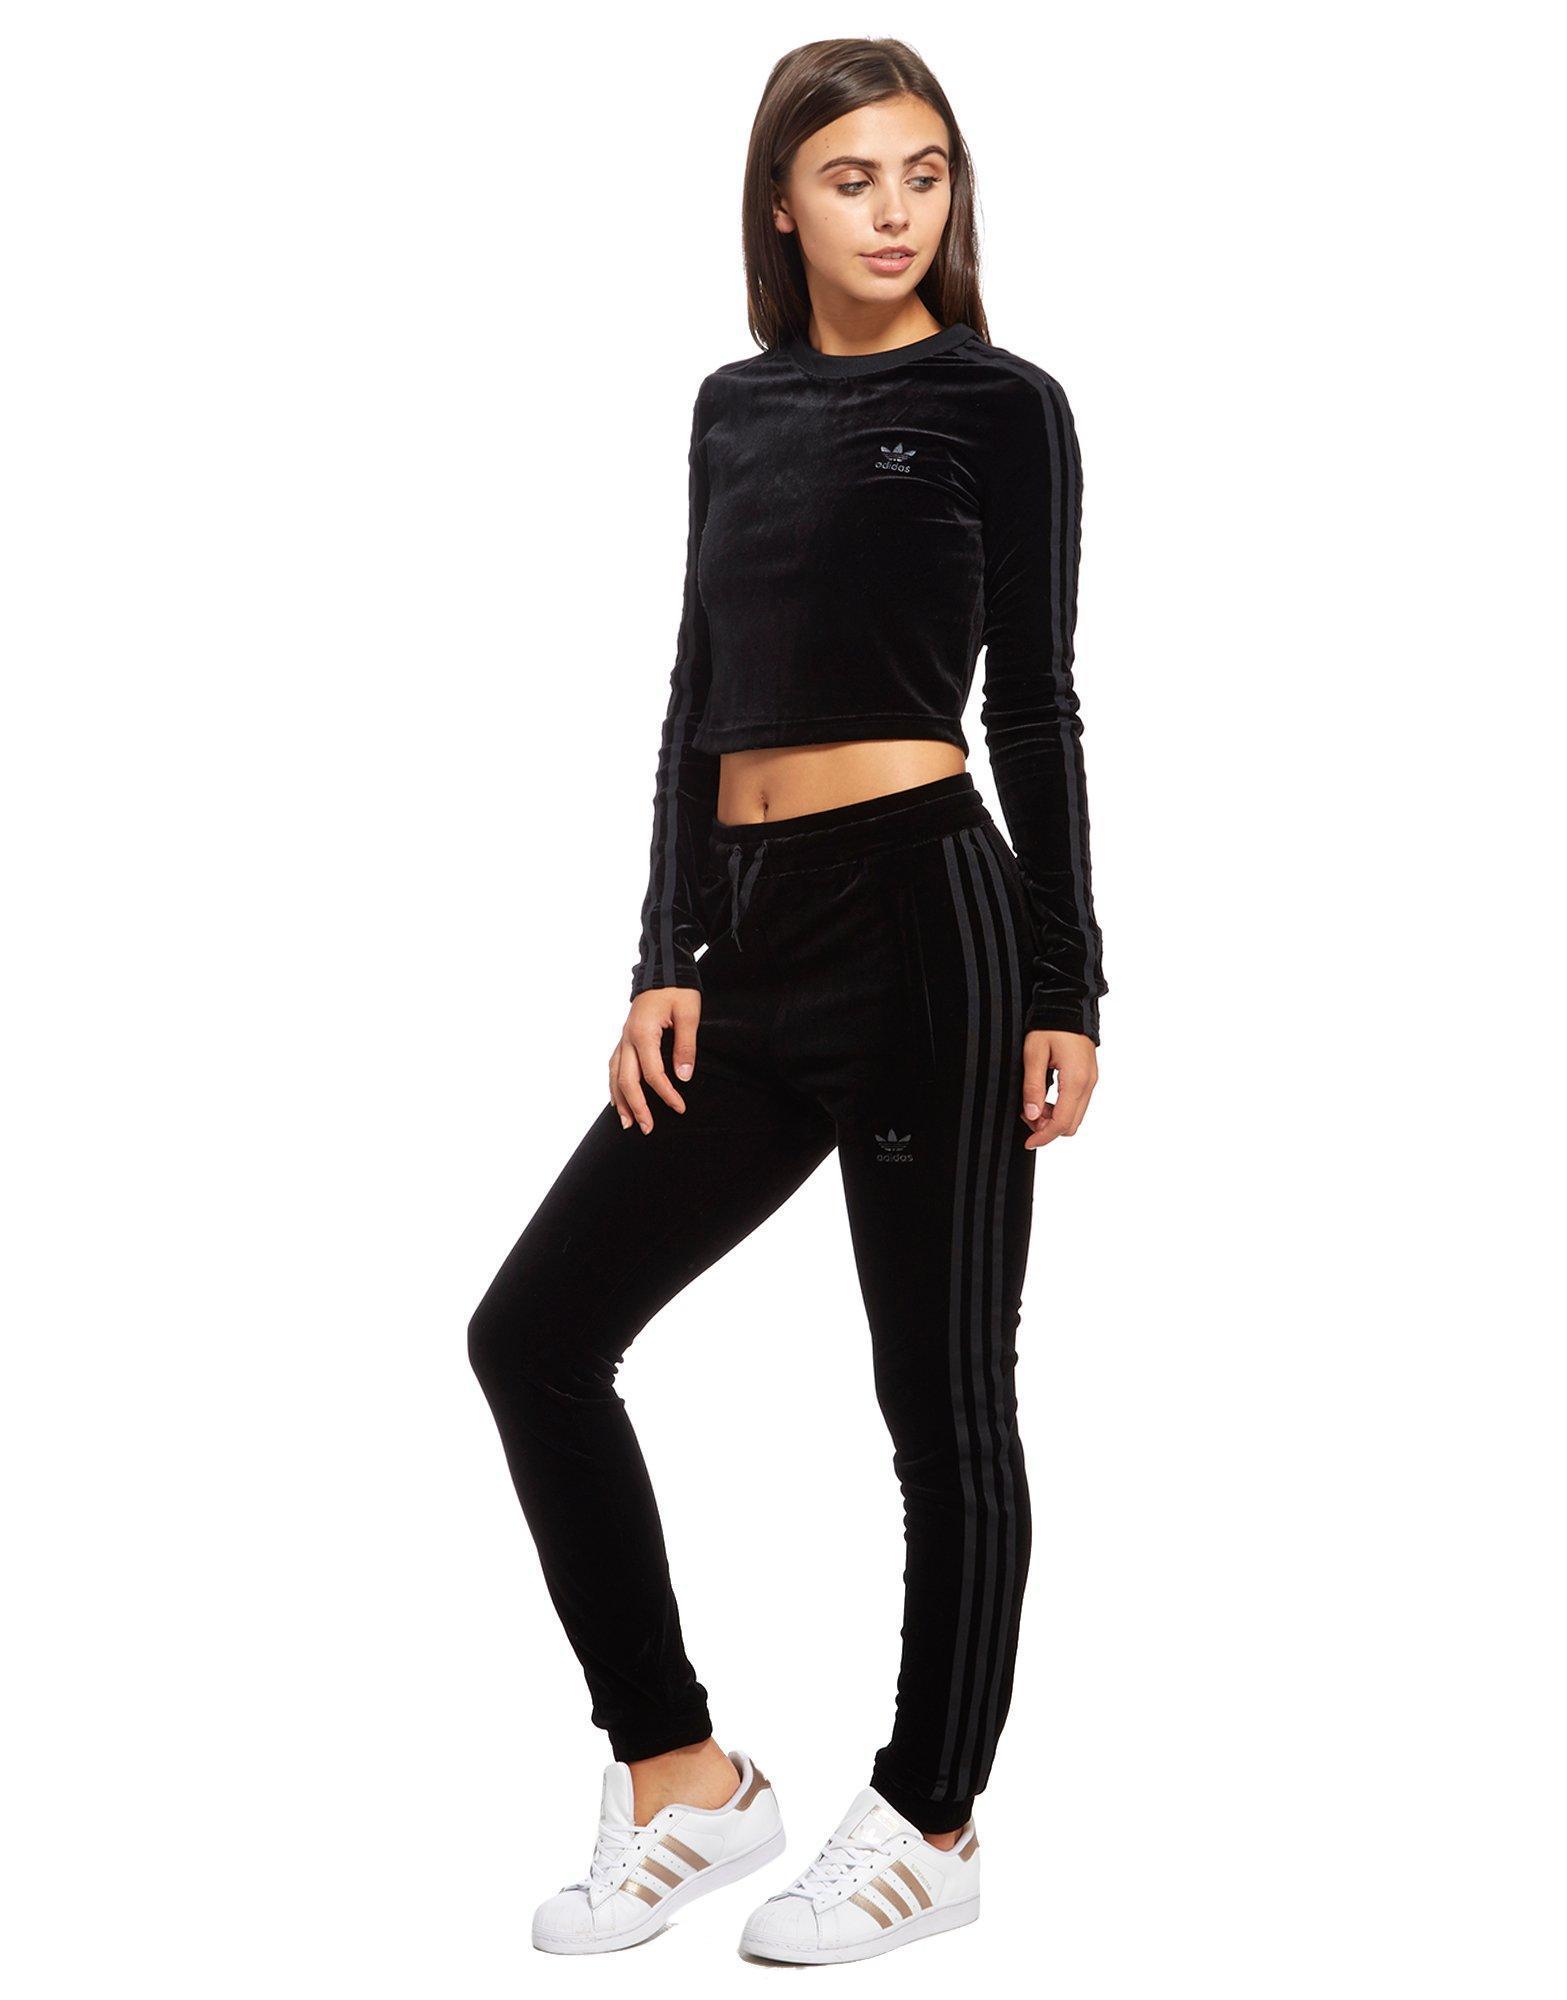 dd6ff987c96e adidas Originals Velvet Vibes Sst Sweatpants in Black - Lyst